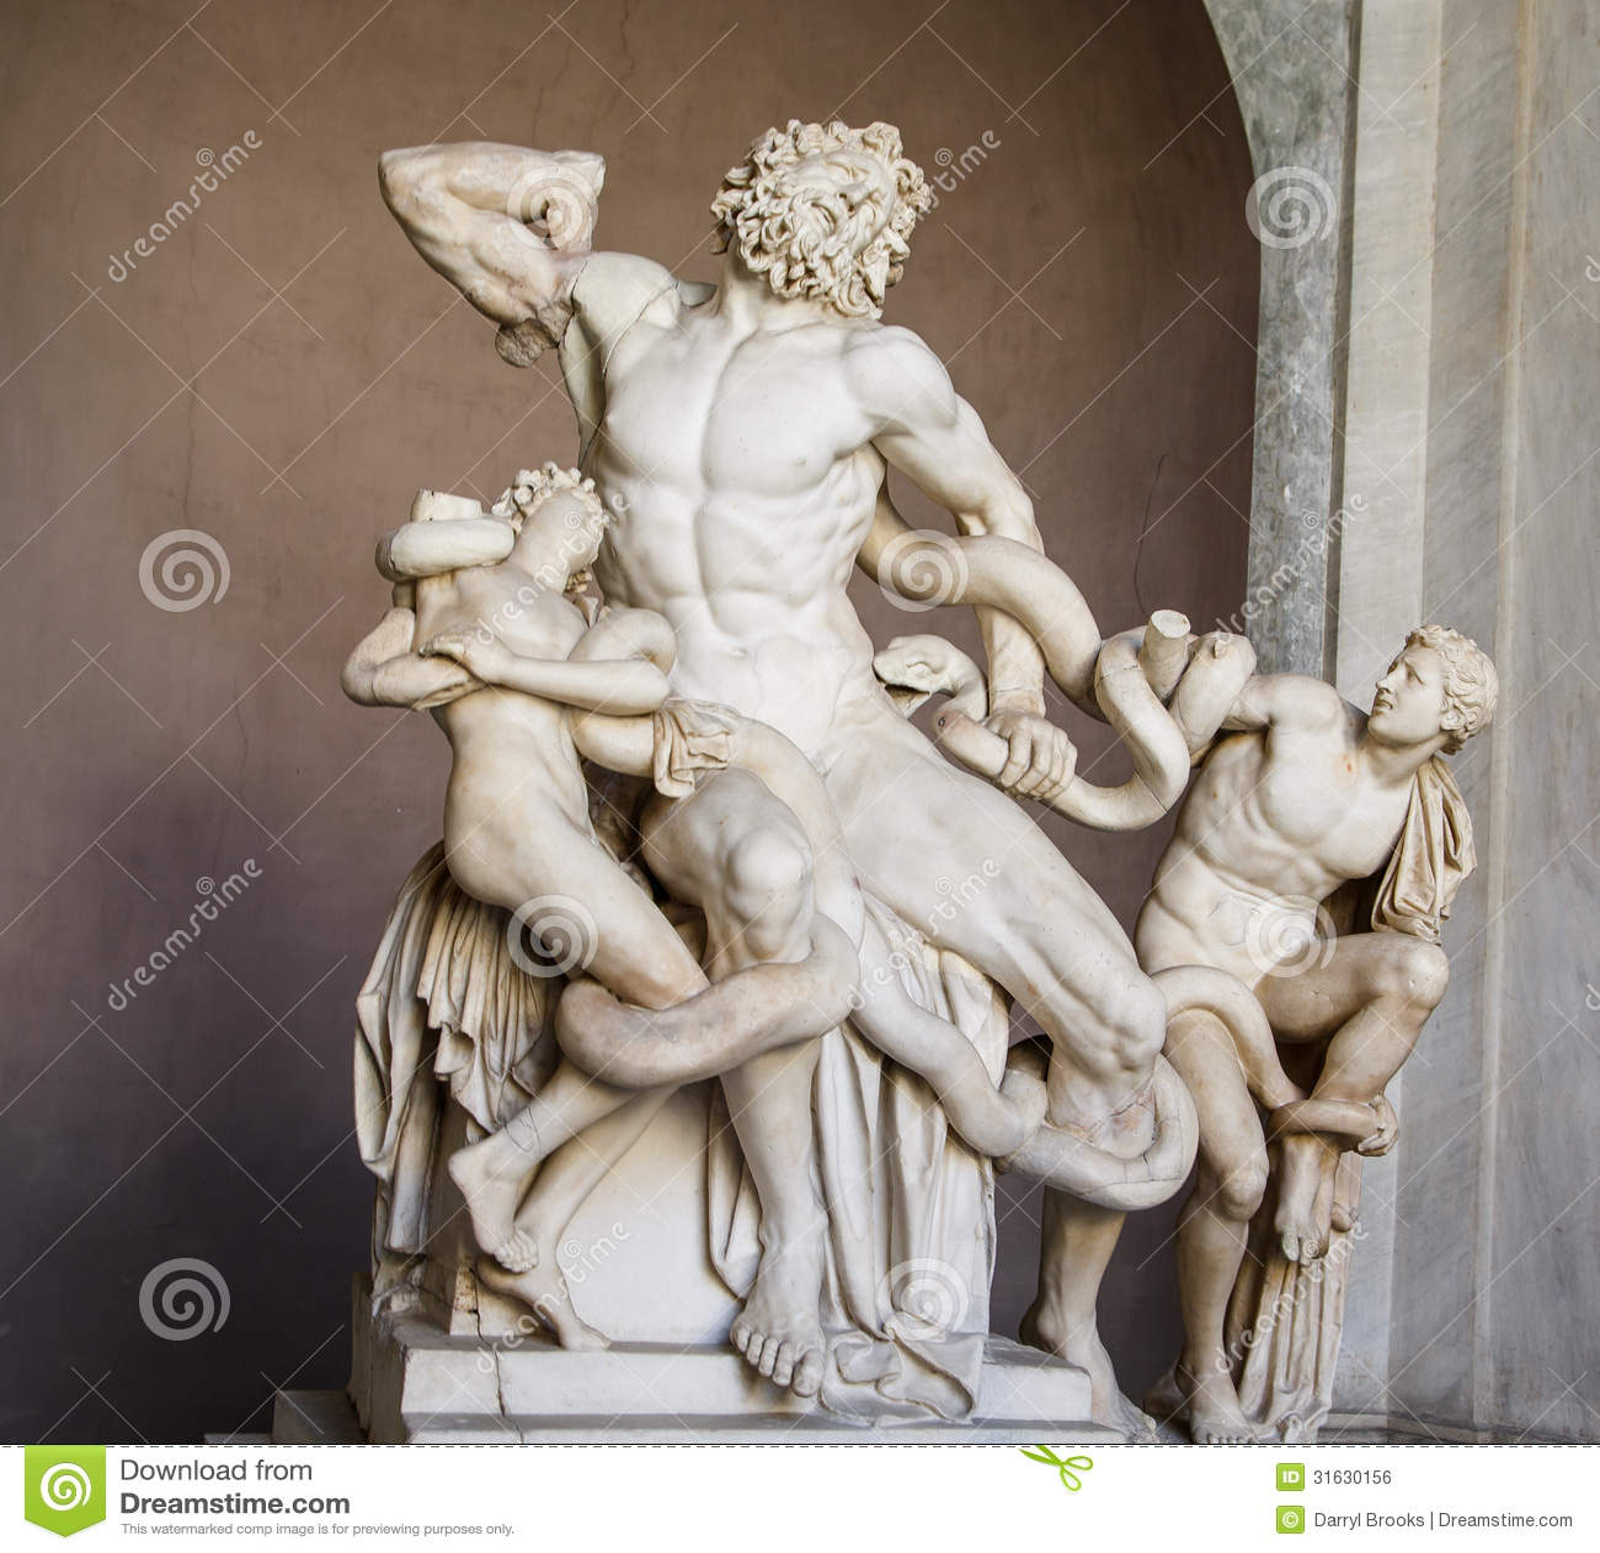 hercules in vatican royalty free stock image image 31630156